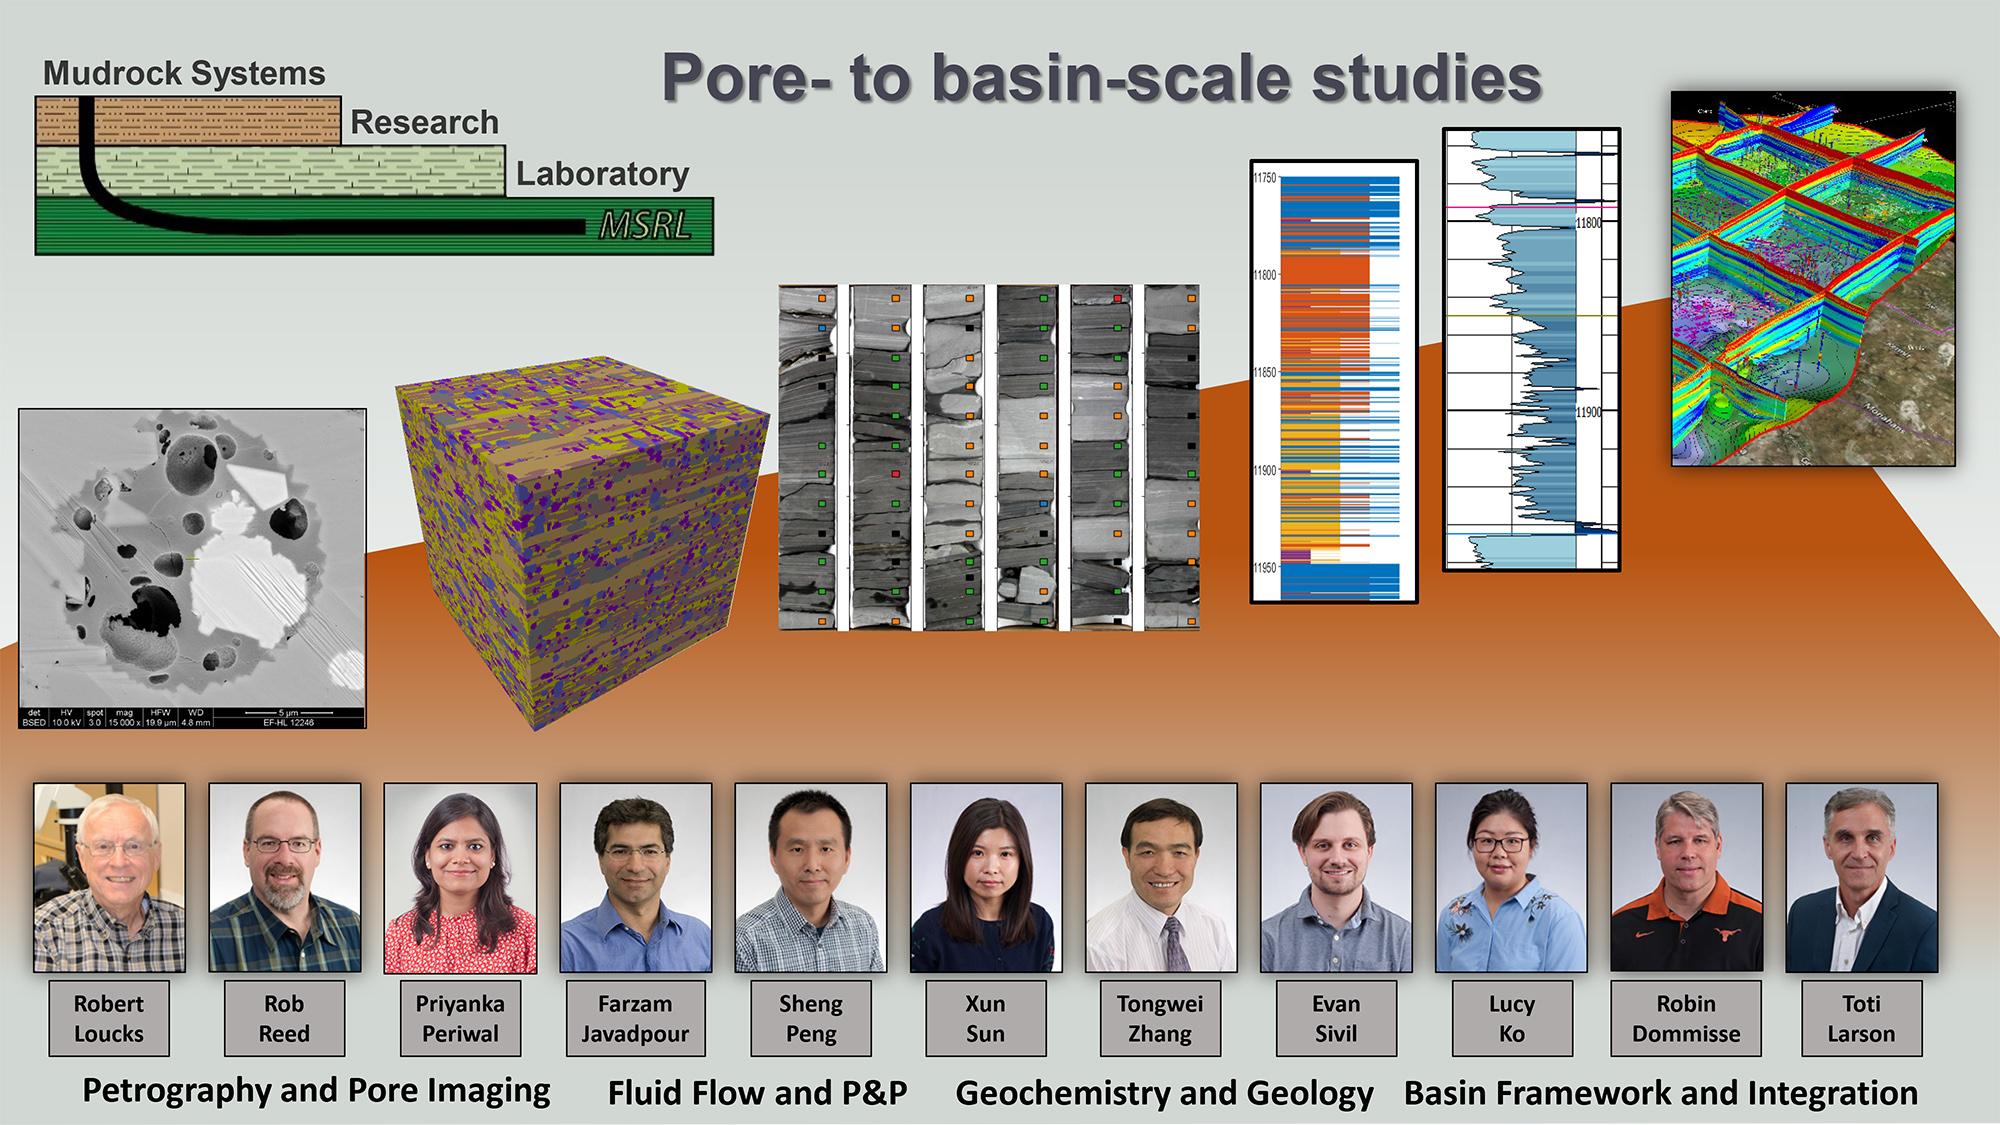 Pore to basin-scale-studies